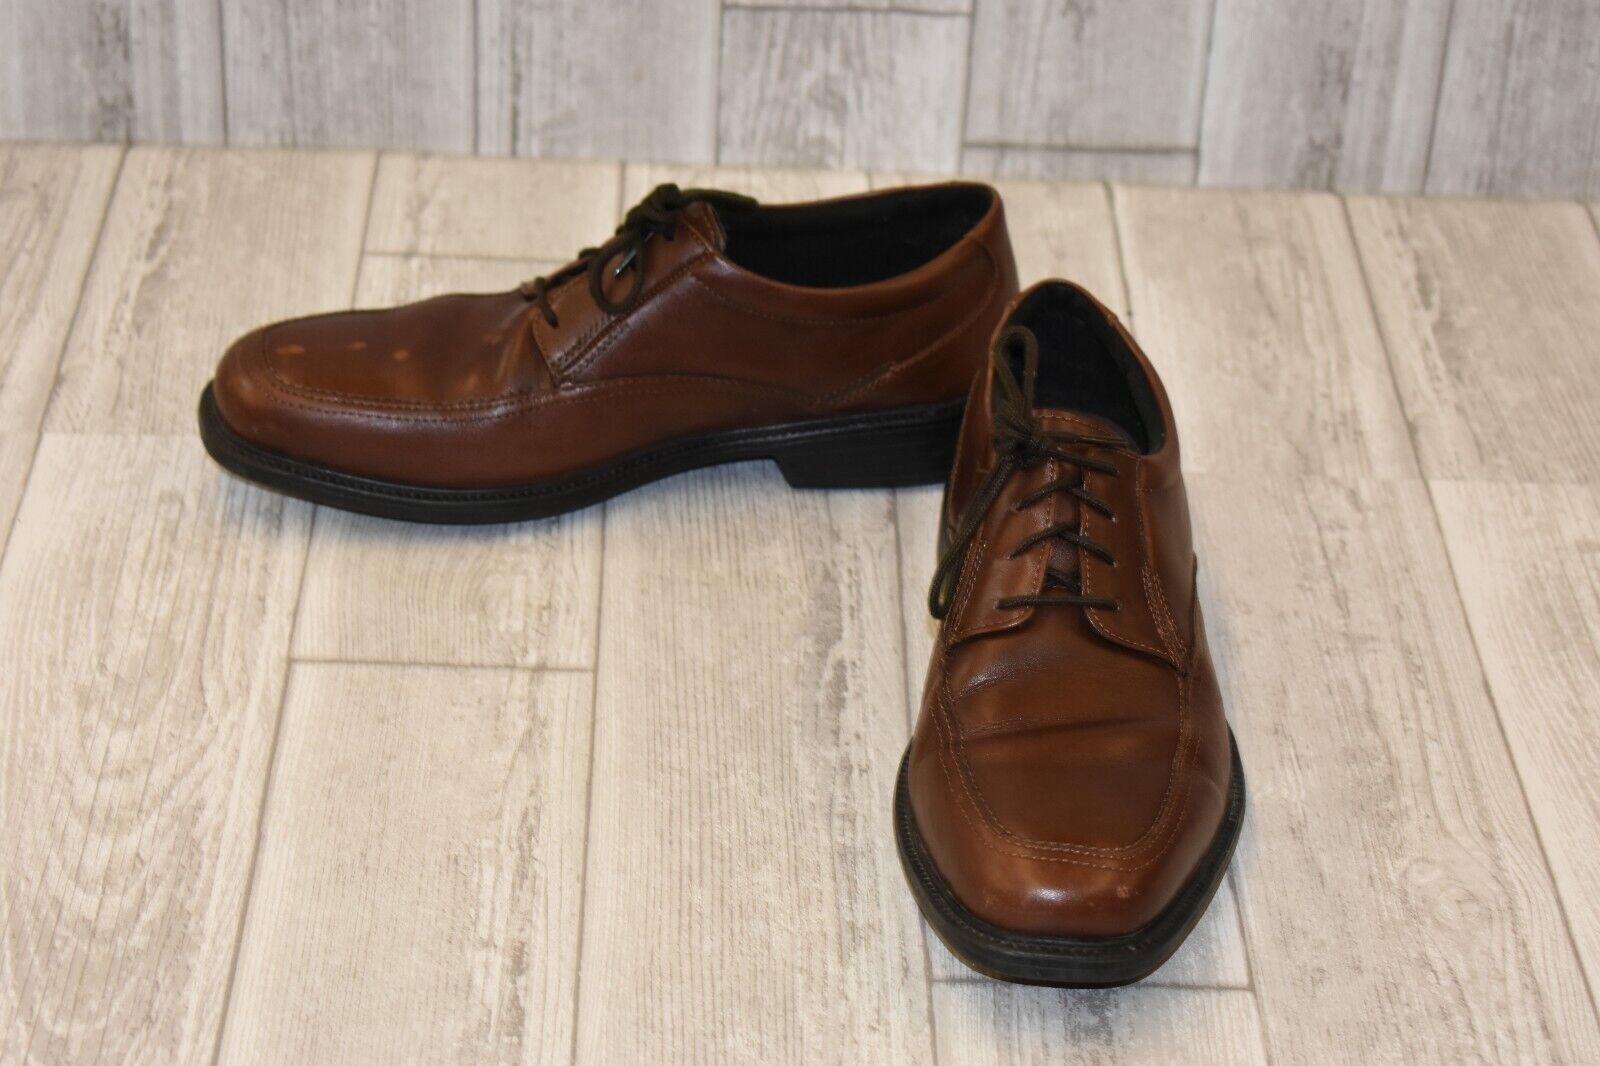 Bostonian Ipswich Oxford shoes - Men's Size 10.5M - Brown